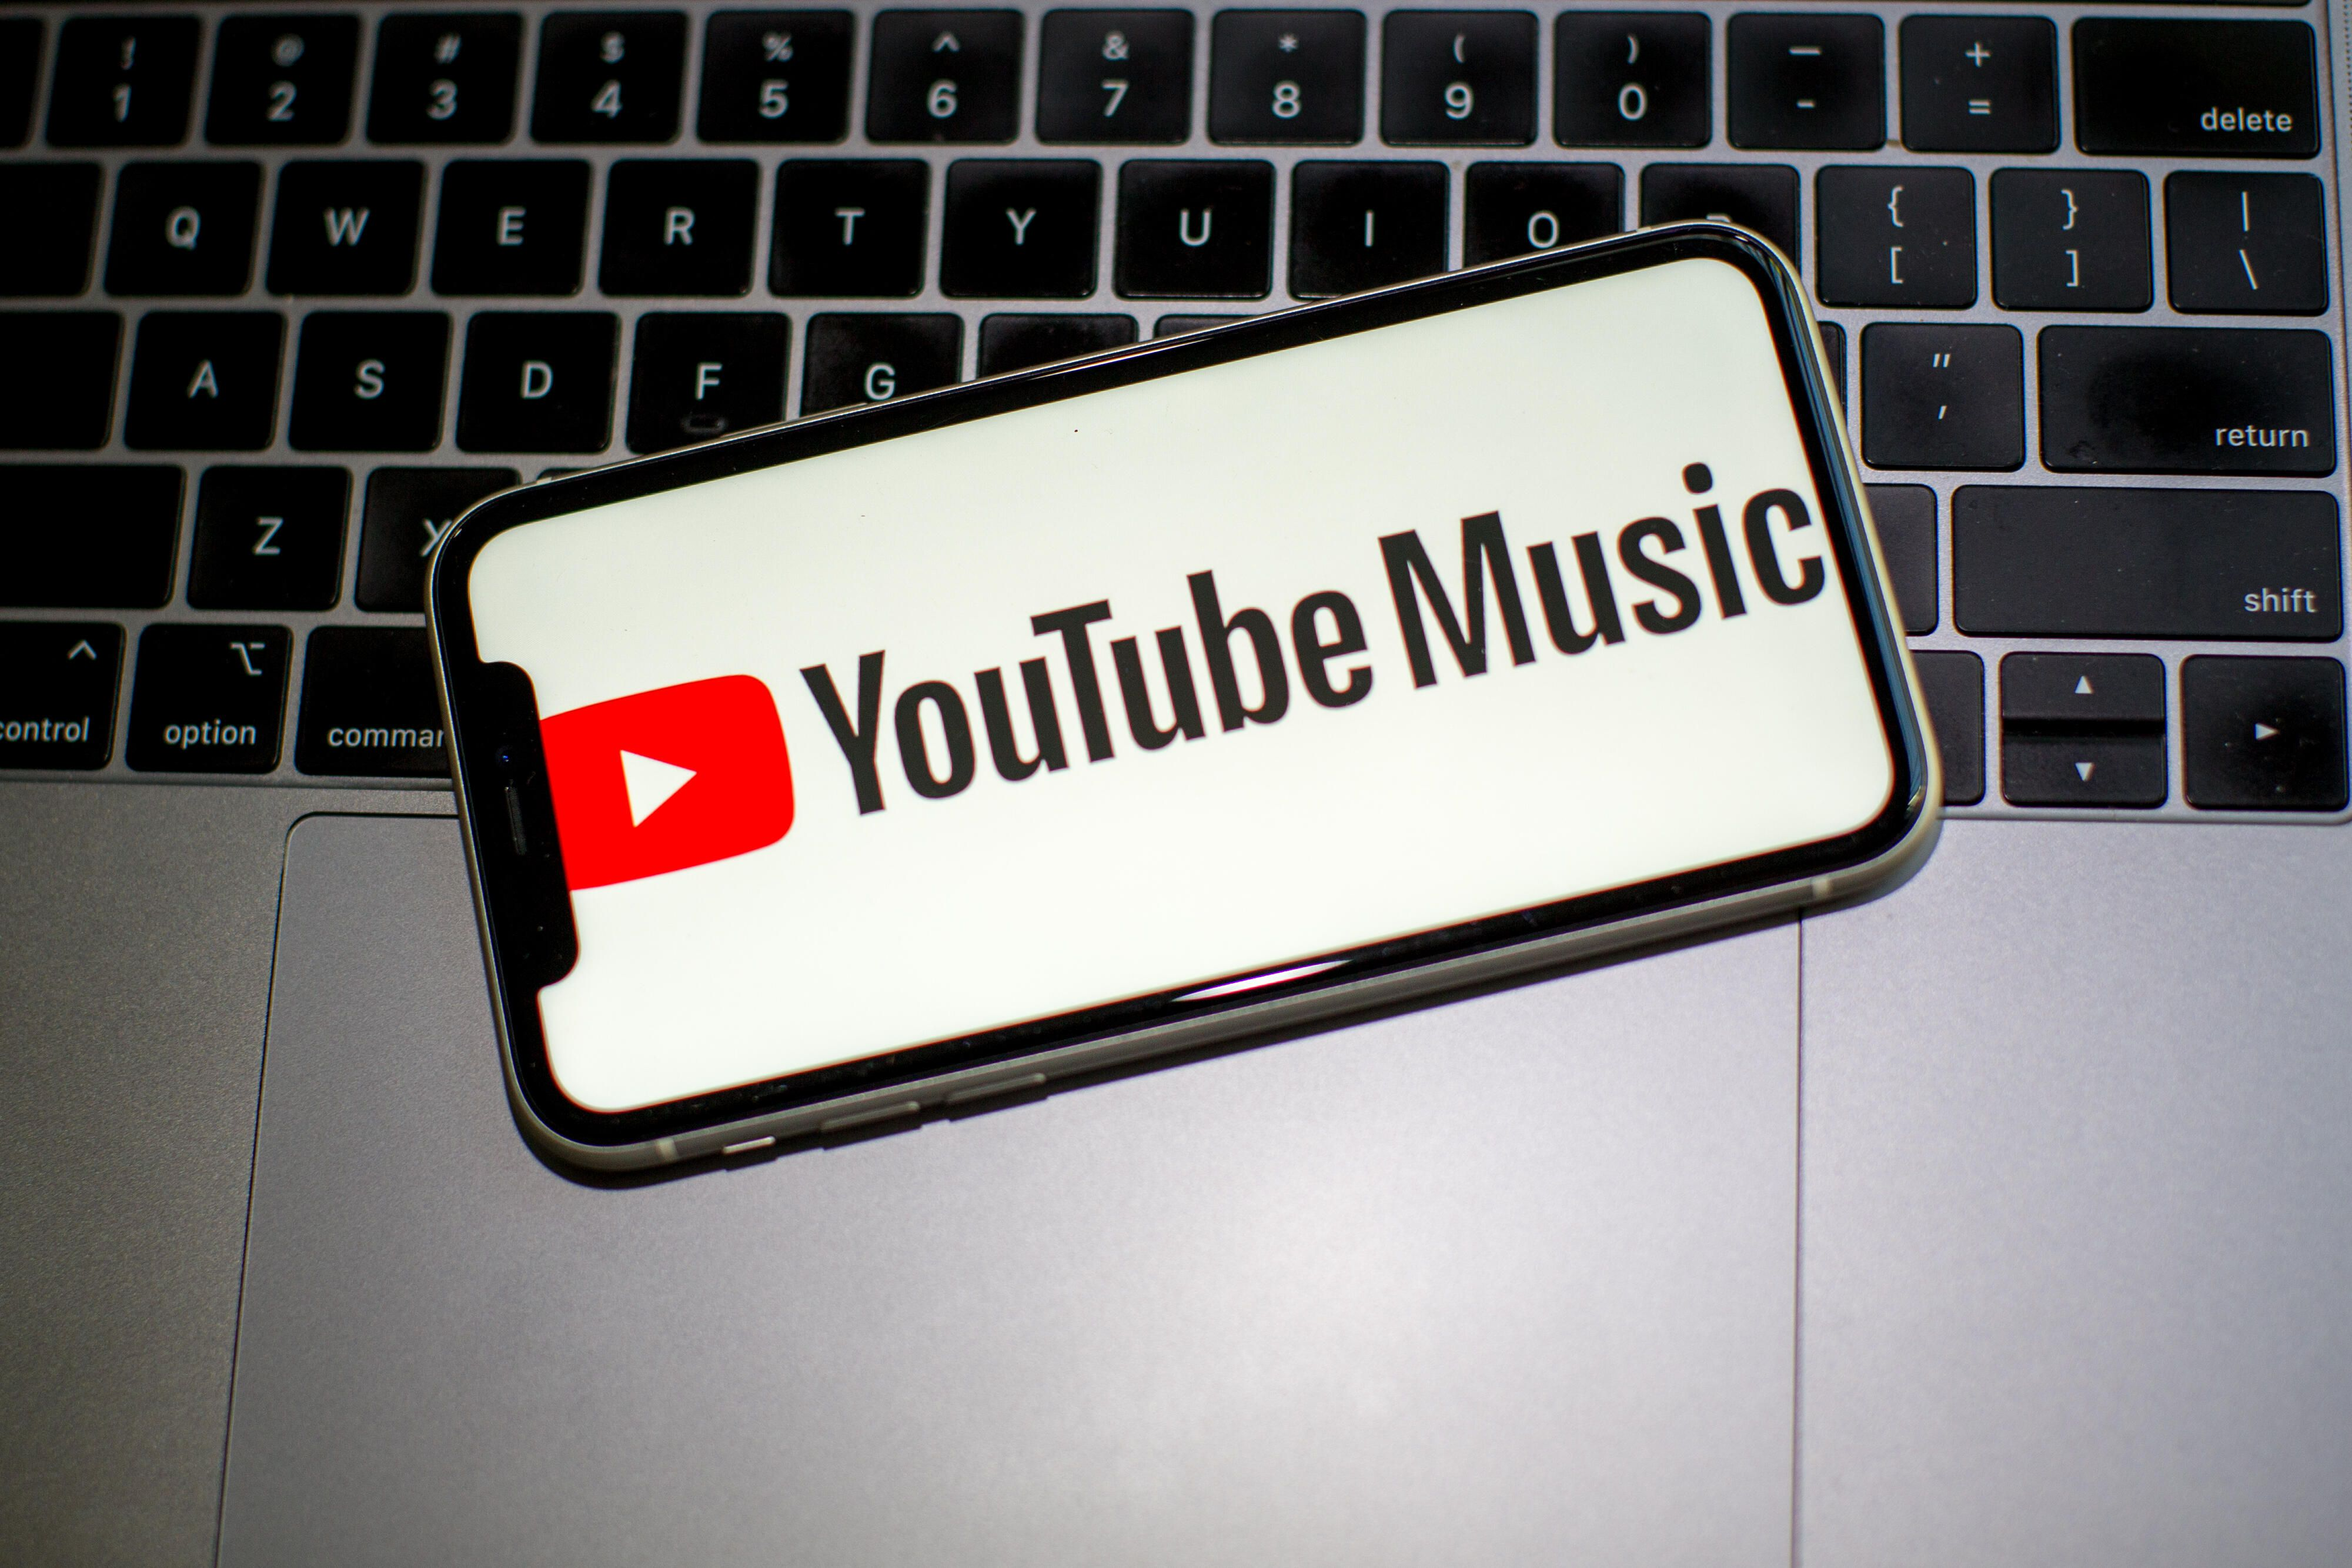 youtube-music-laptop-2488